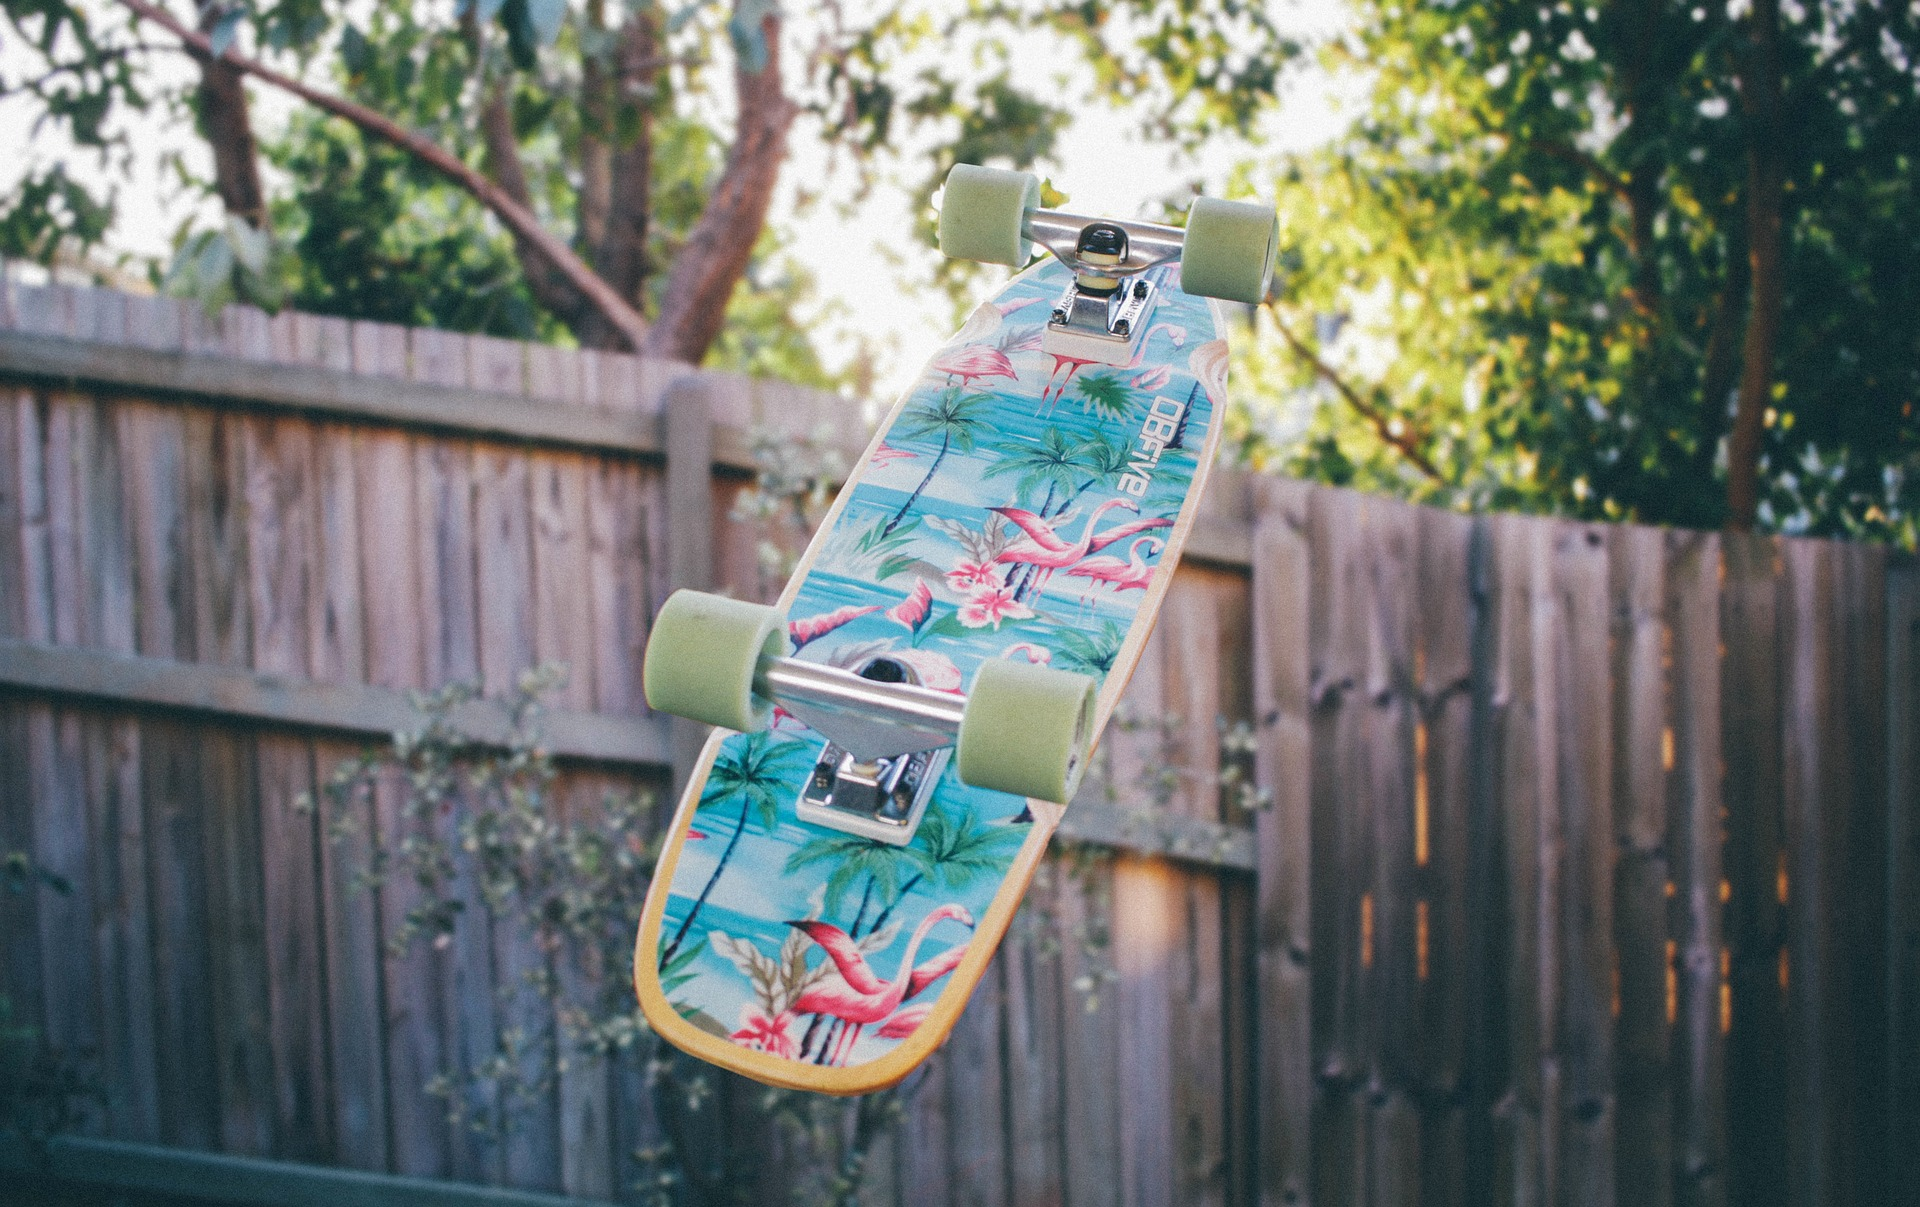 Bredt udvalg til skate – Mangler du et skateboard eller rulleskøjter?